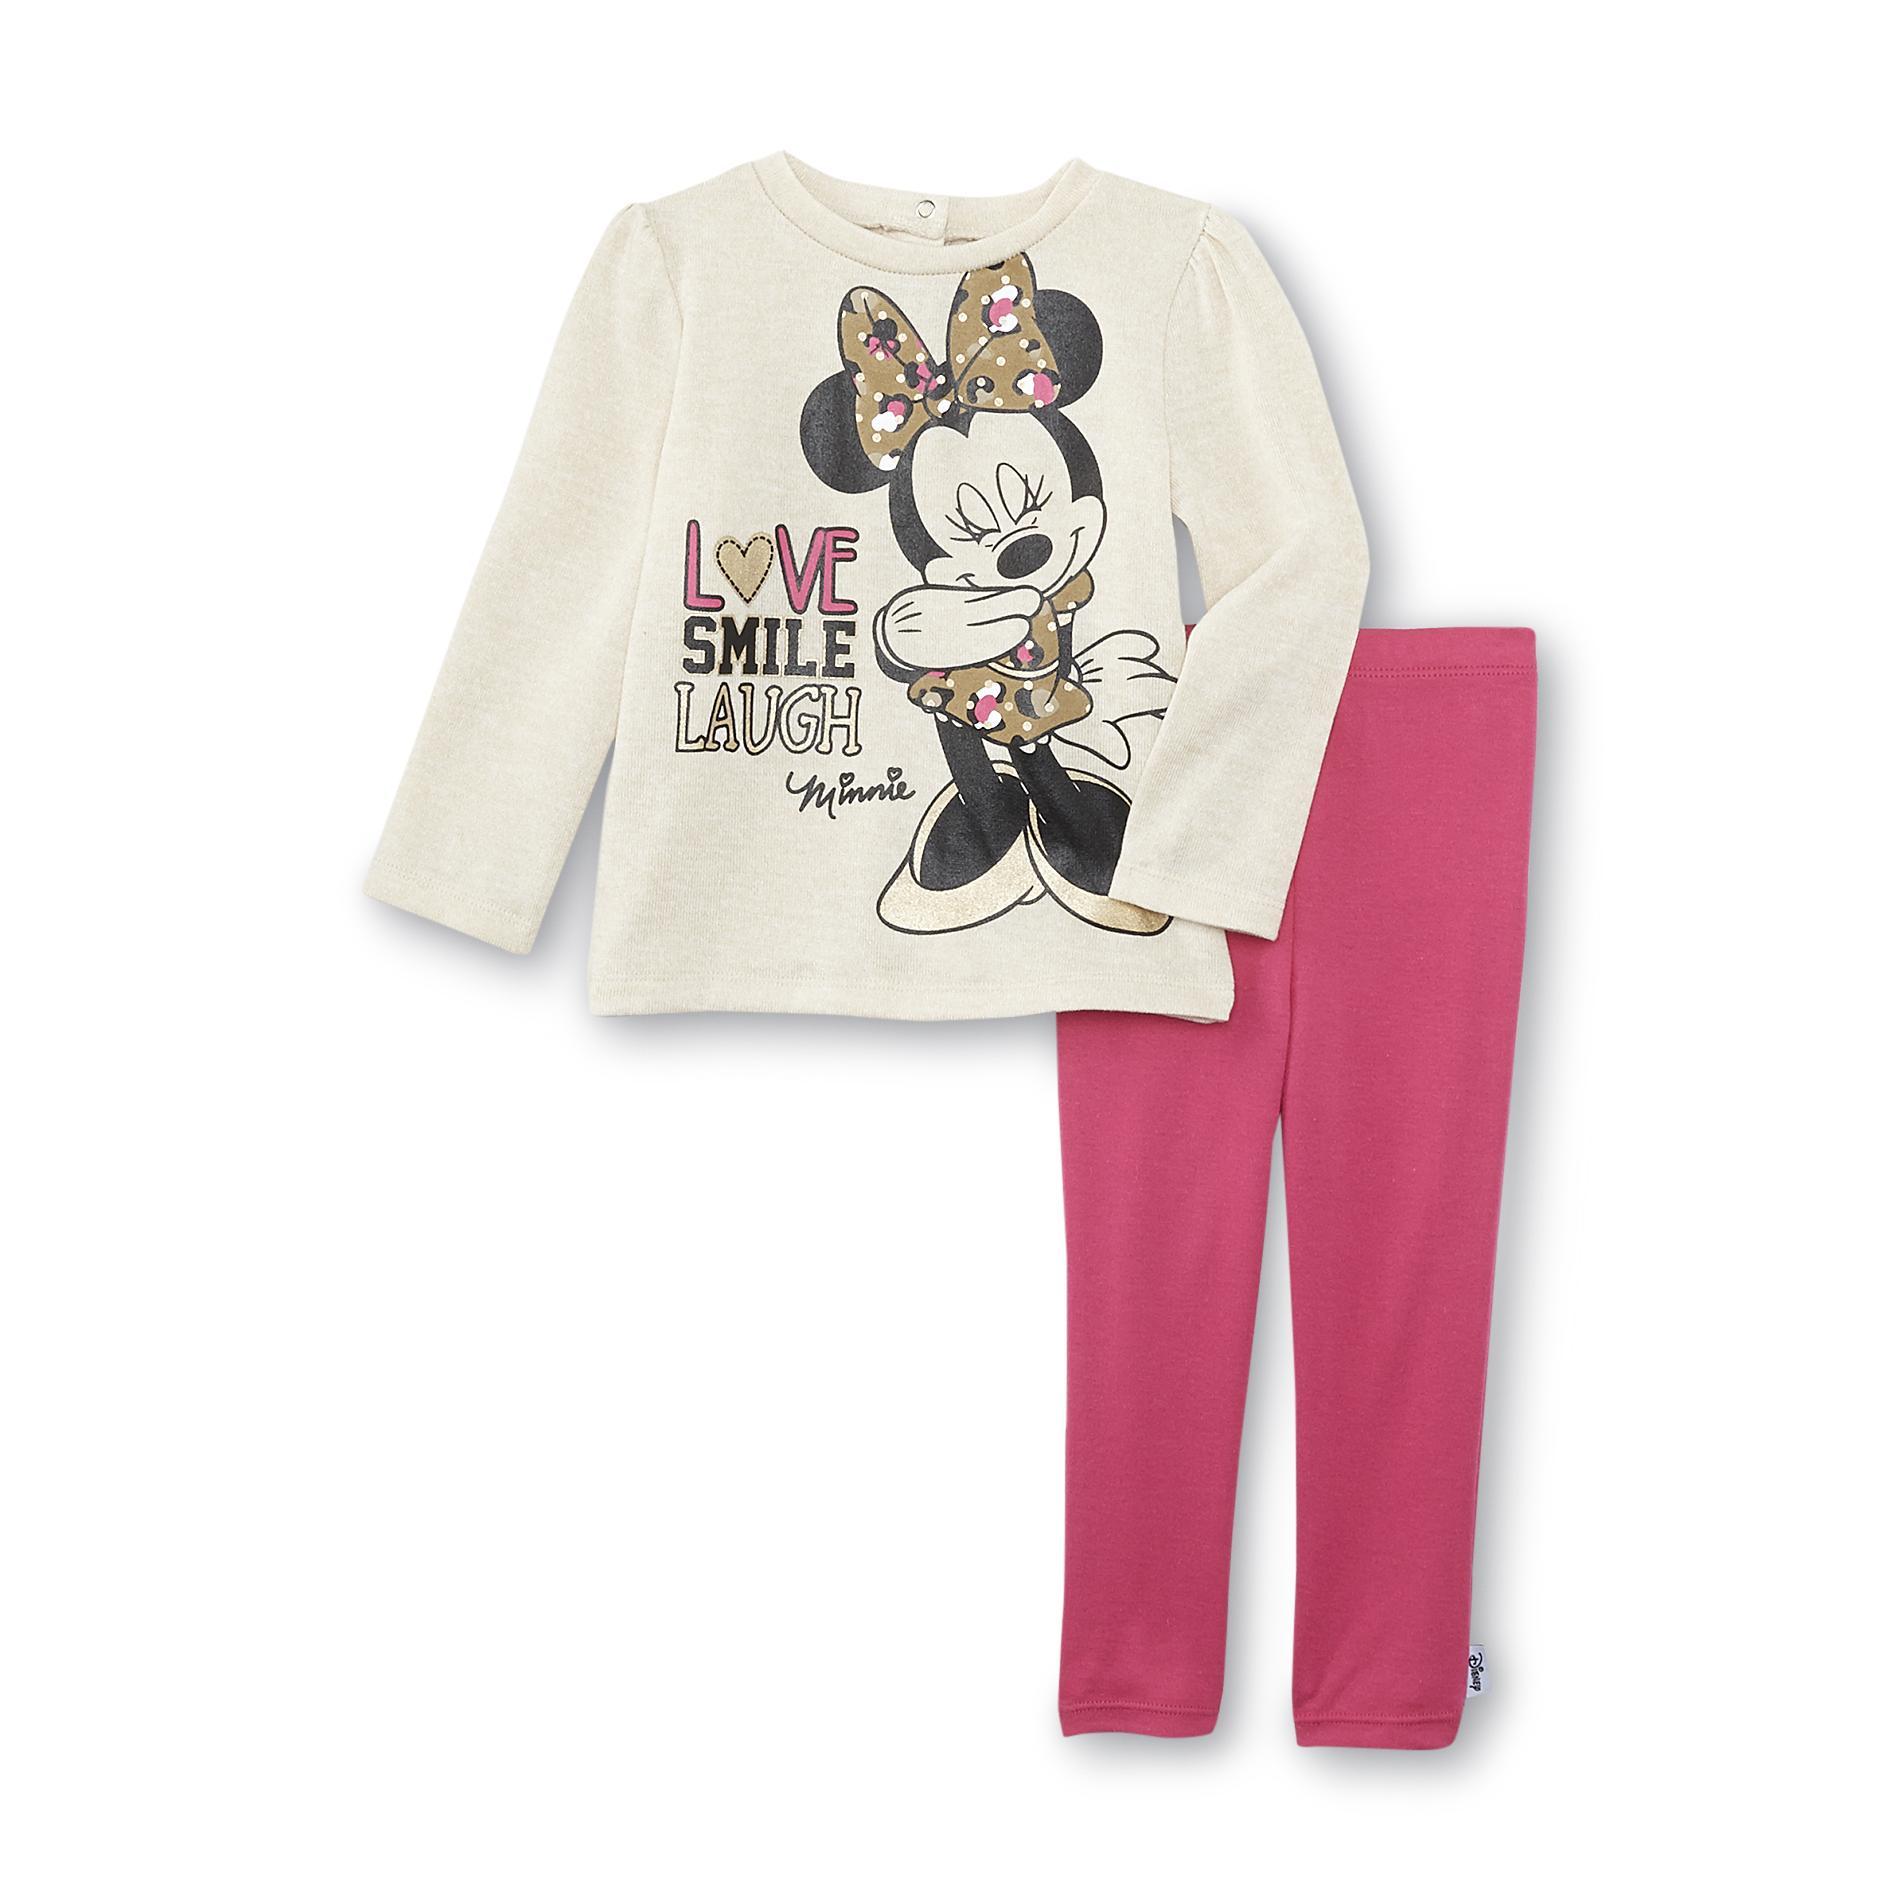 Disney Baby Minnie Mouse Newborn & Infant Girl's Sweater & Leggings - Love